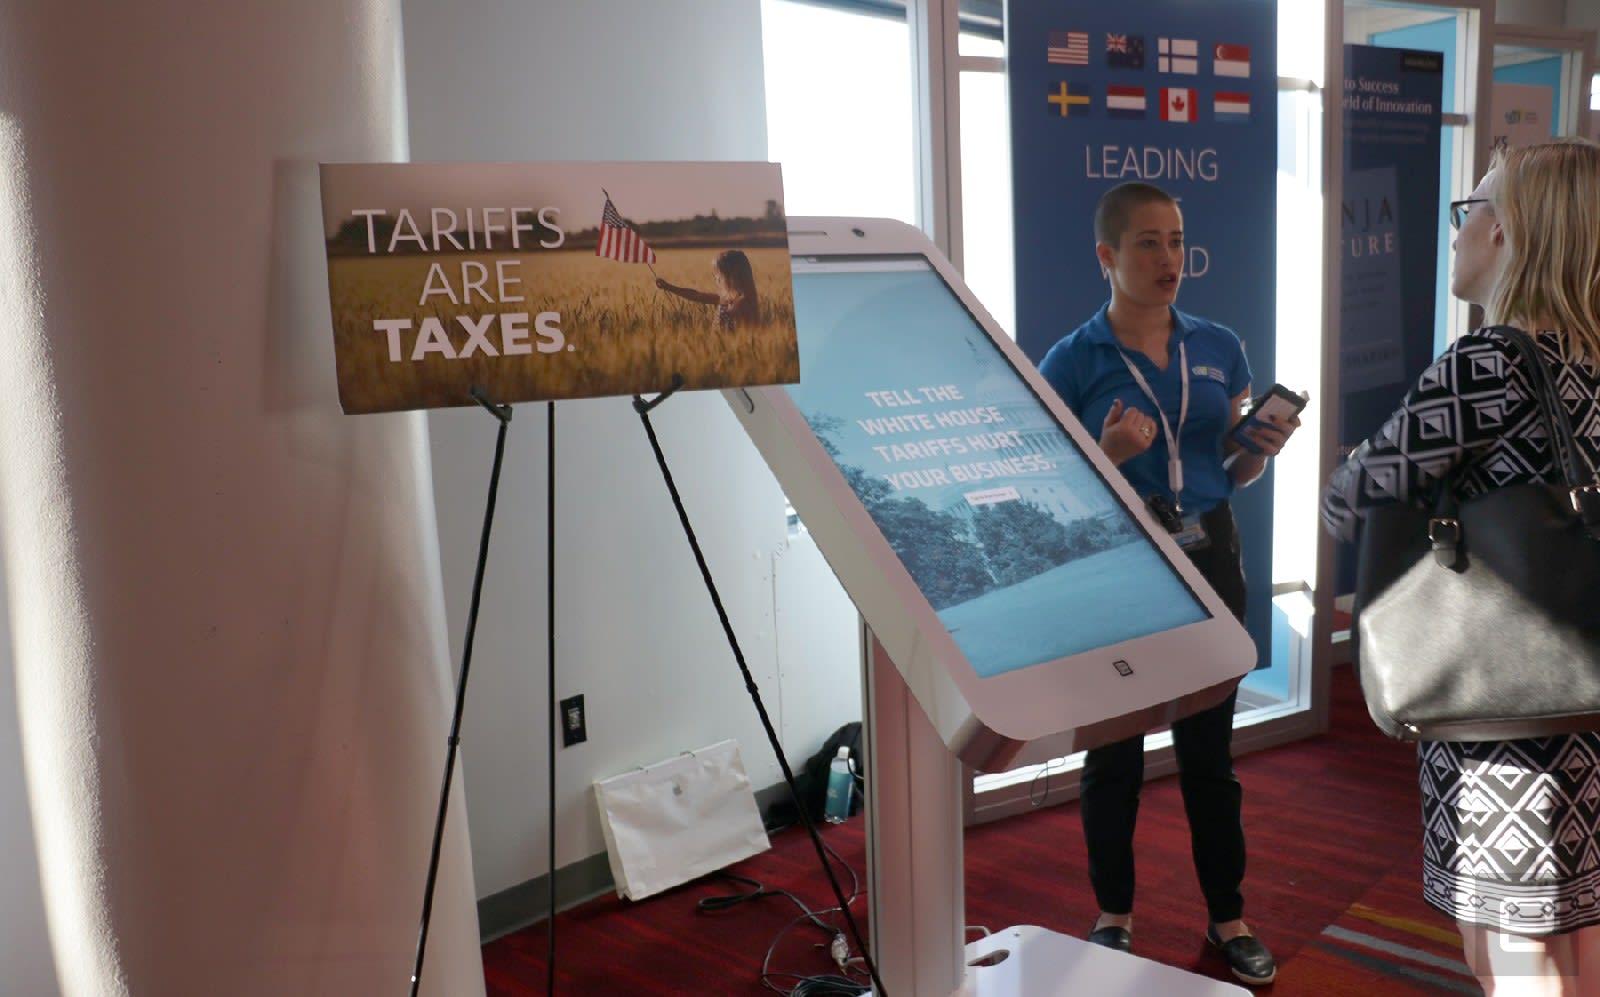 Tariffs at CES 2019